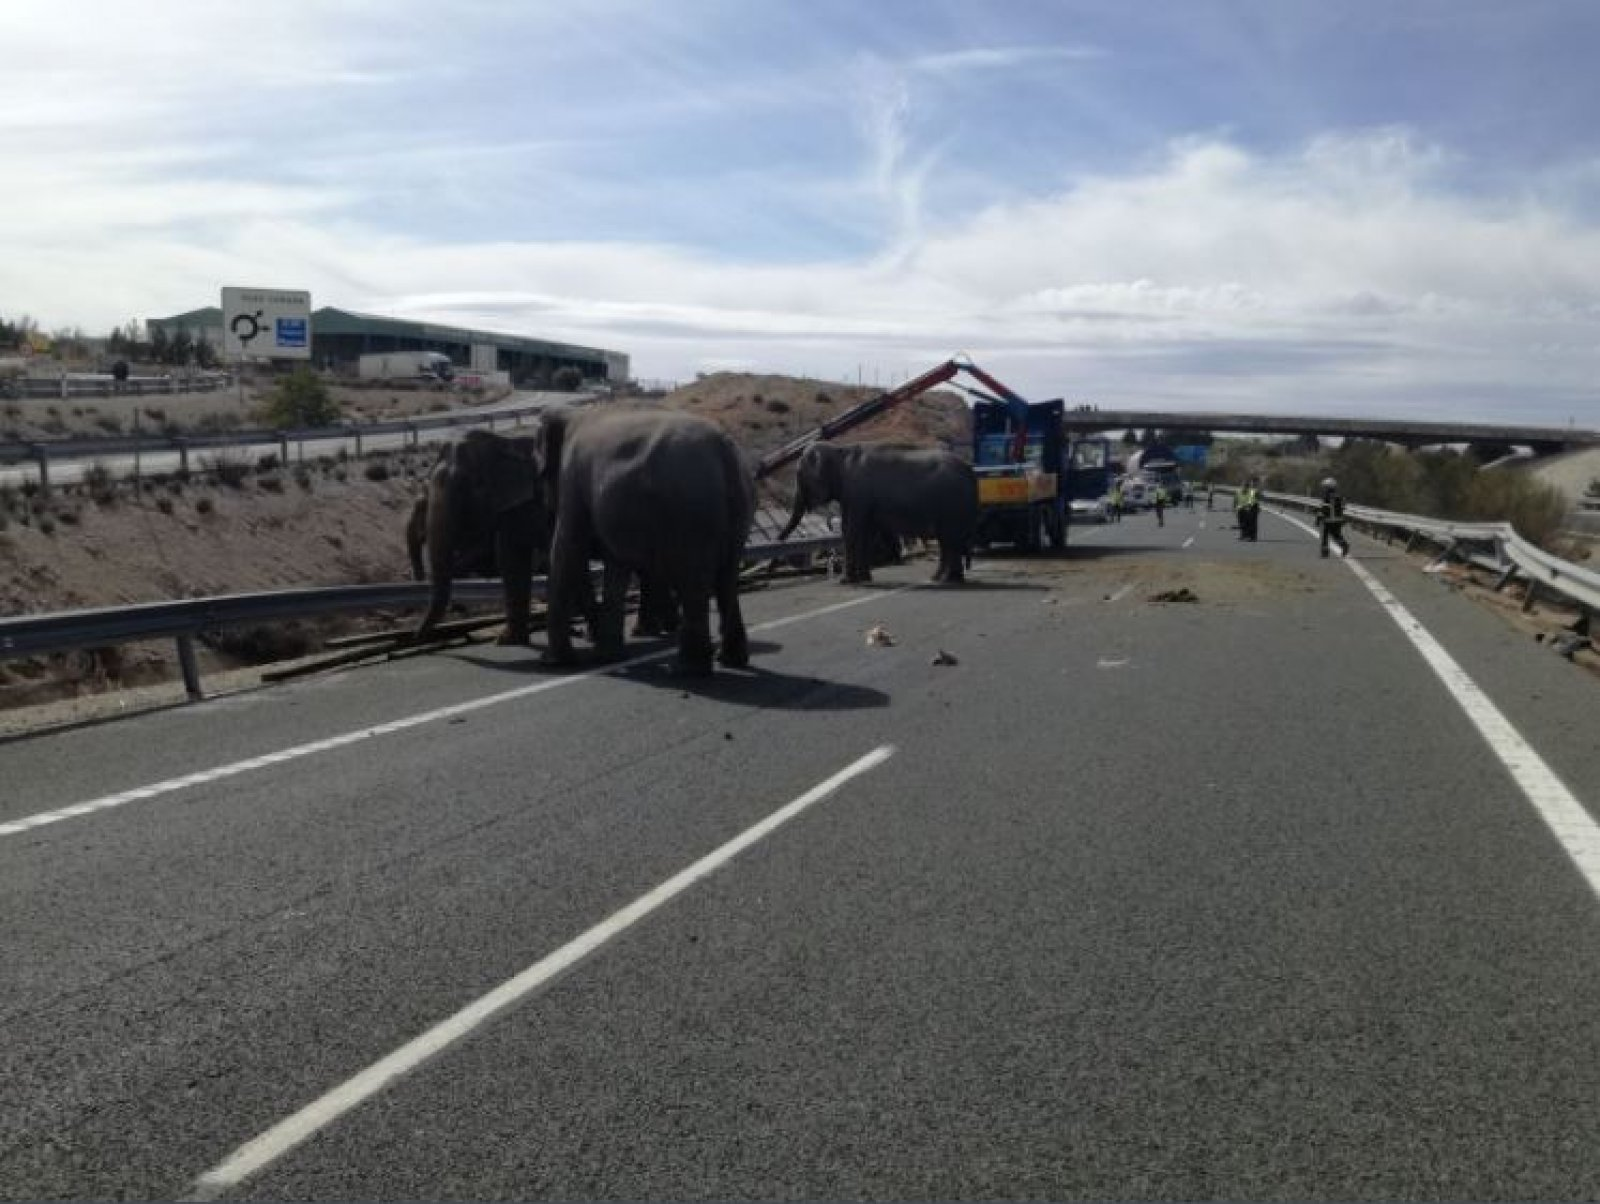 Elefants a l'autovia de Múrcia